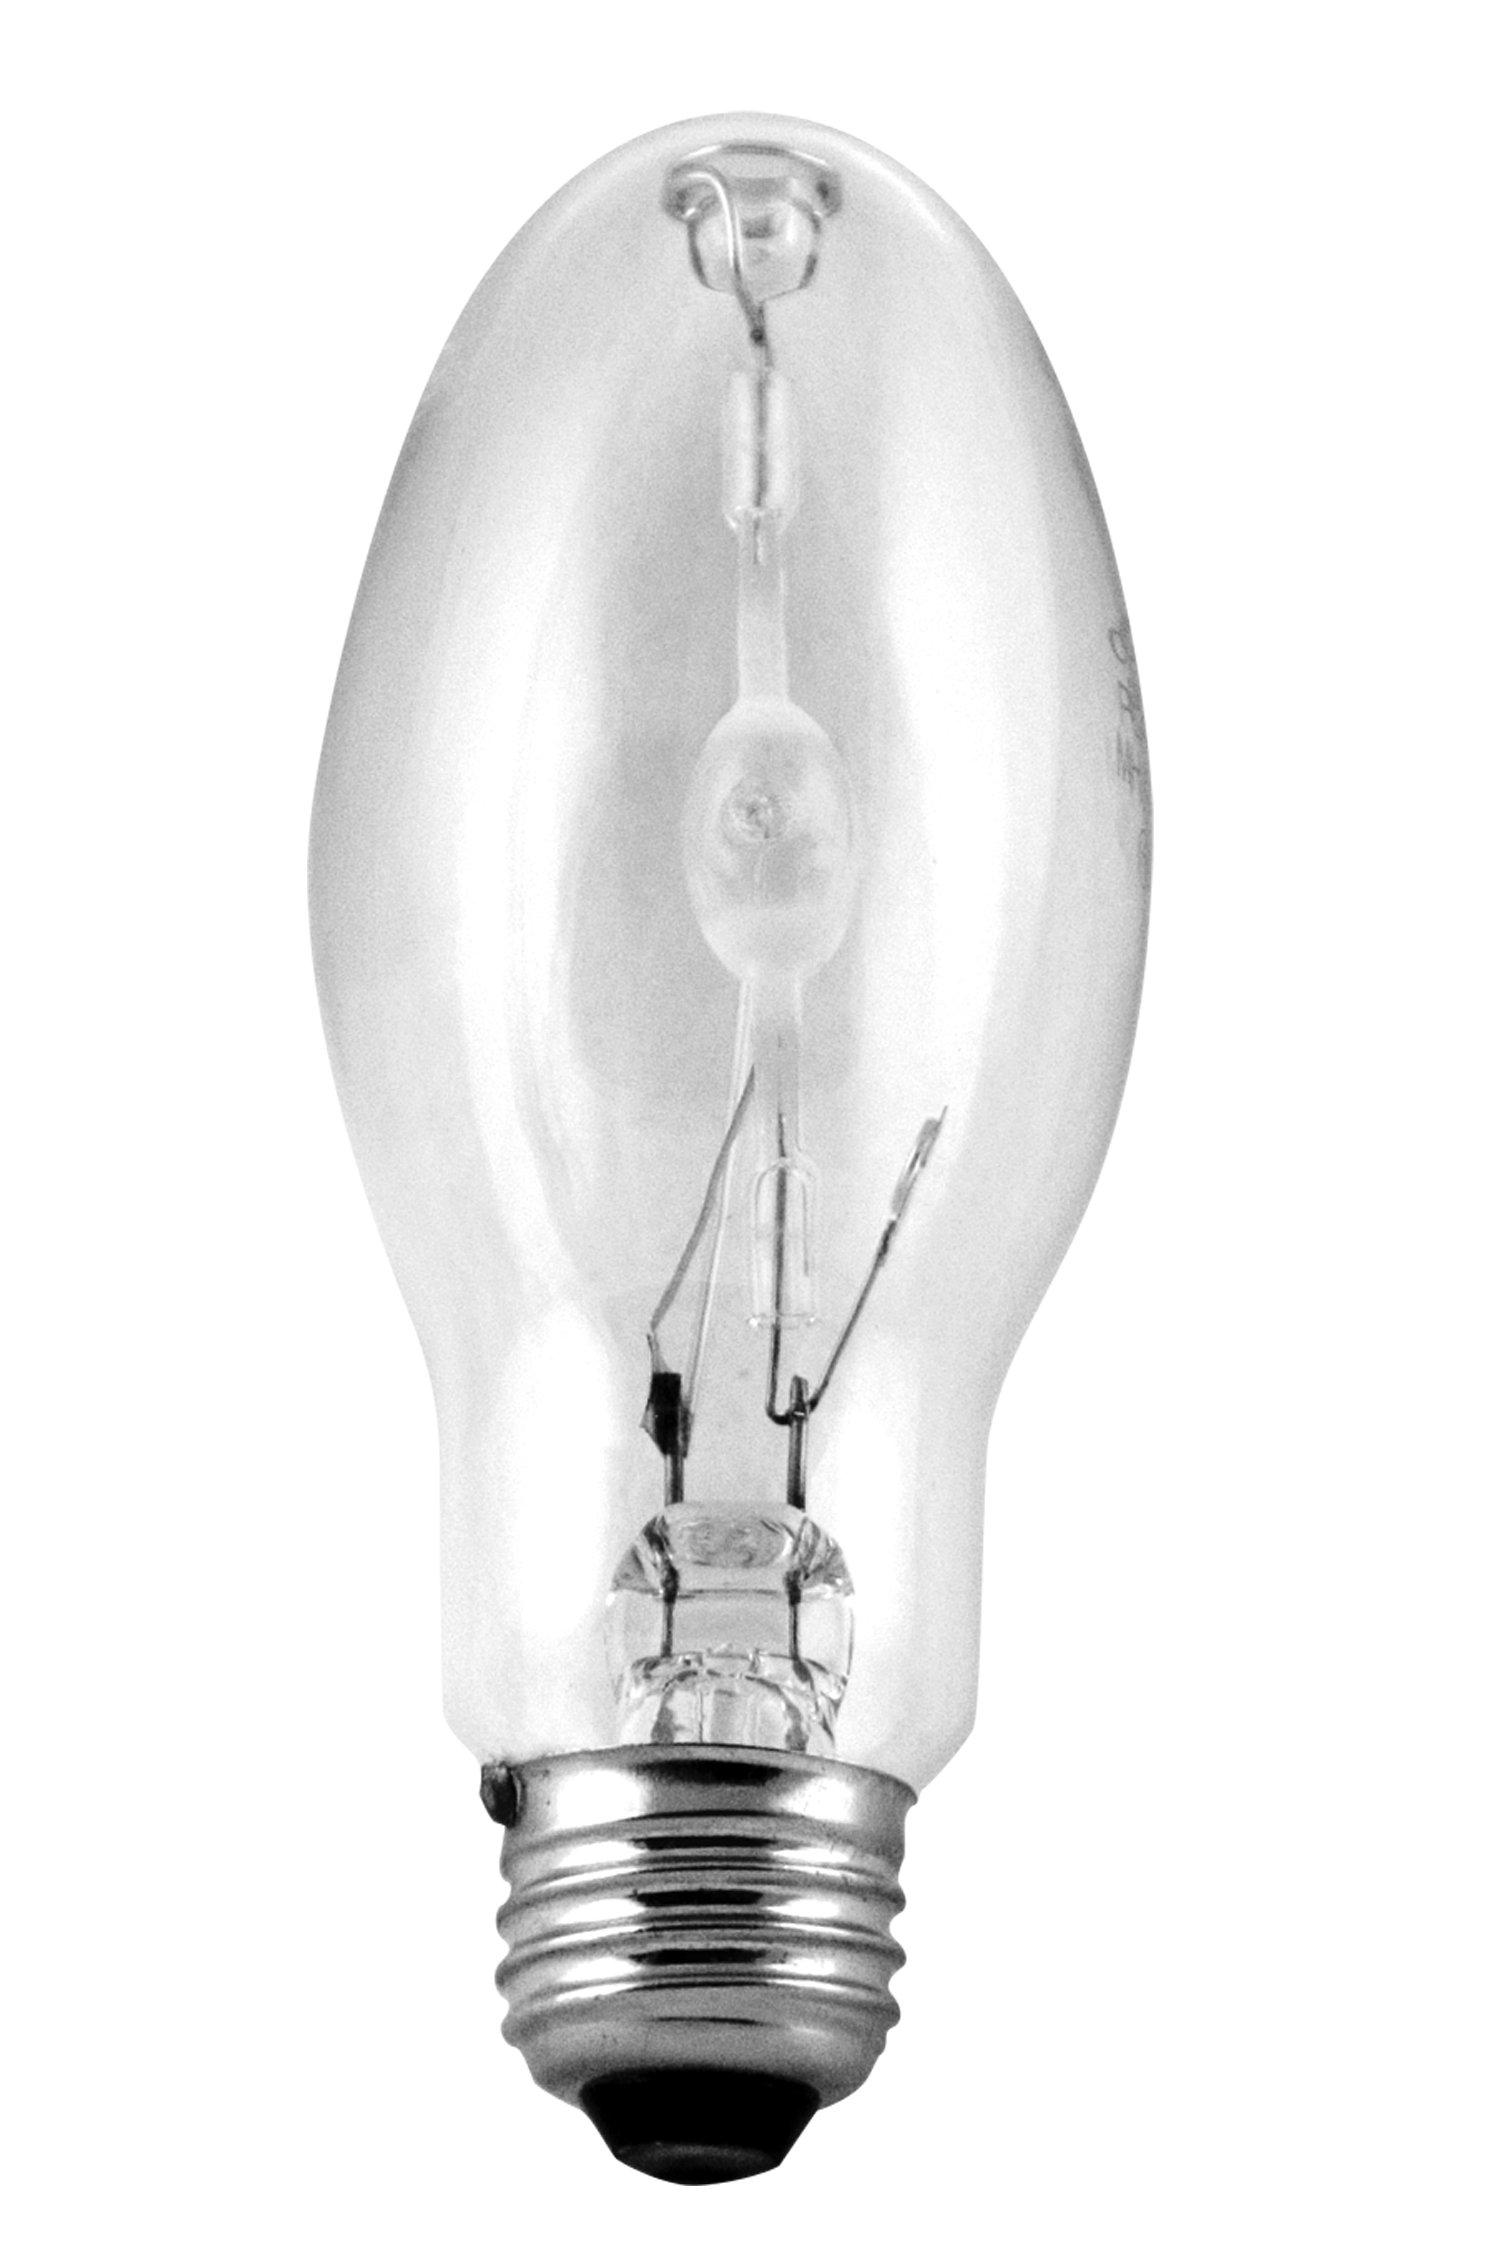 Howard Lighting MH400/U/ED28 400W Metal Halide Lamp